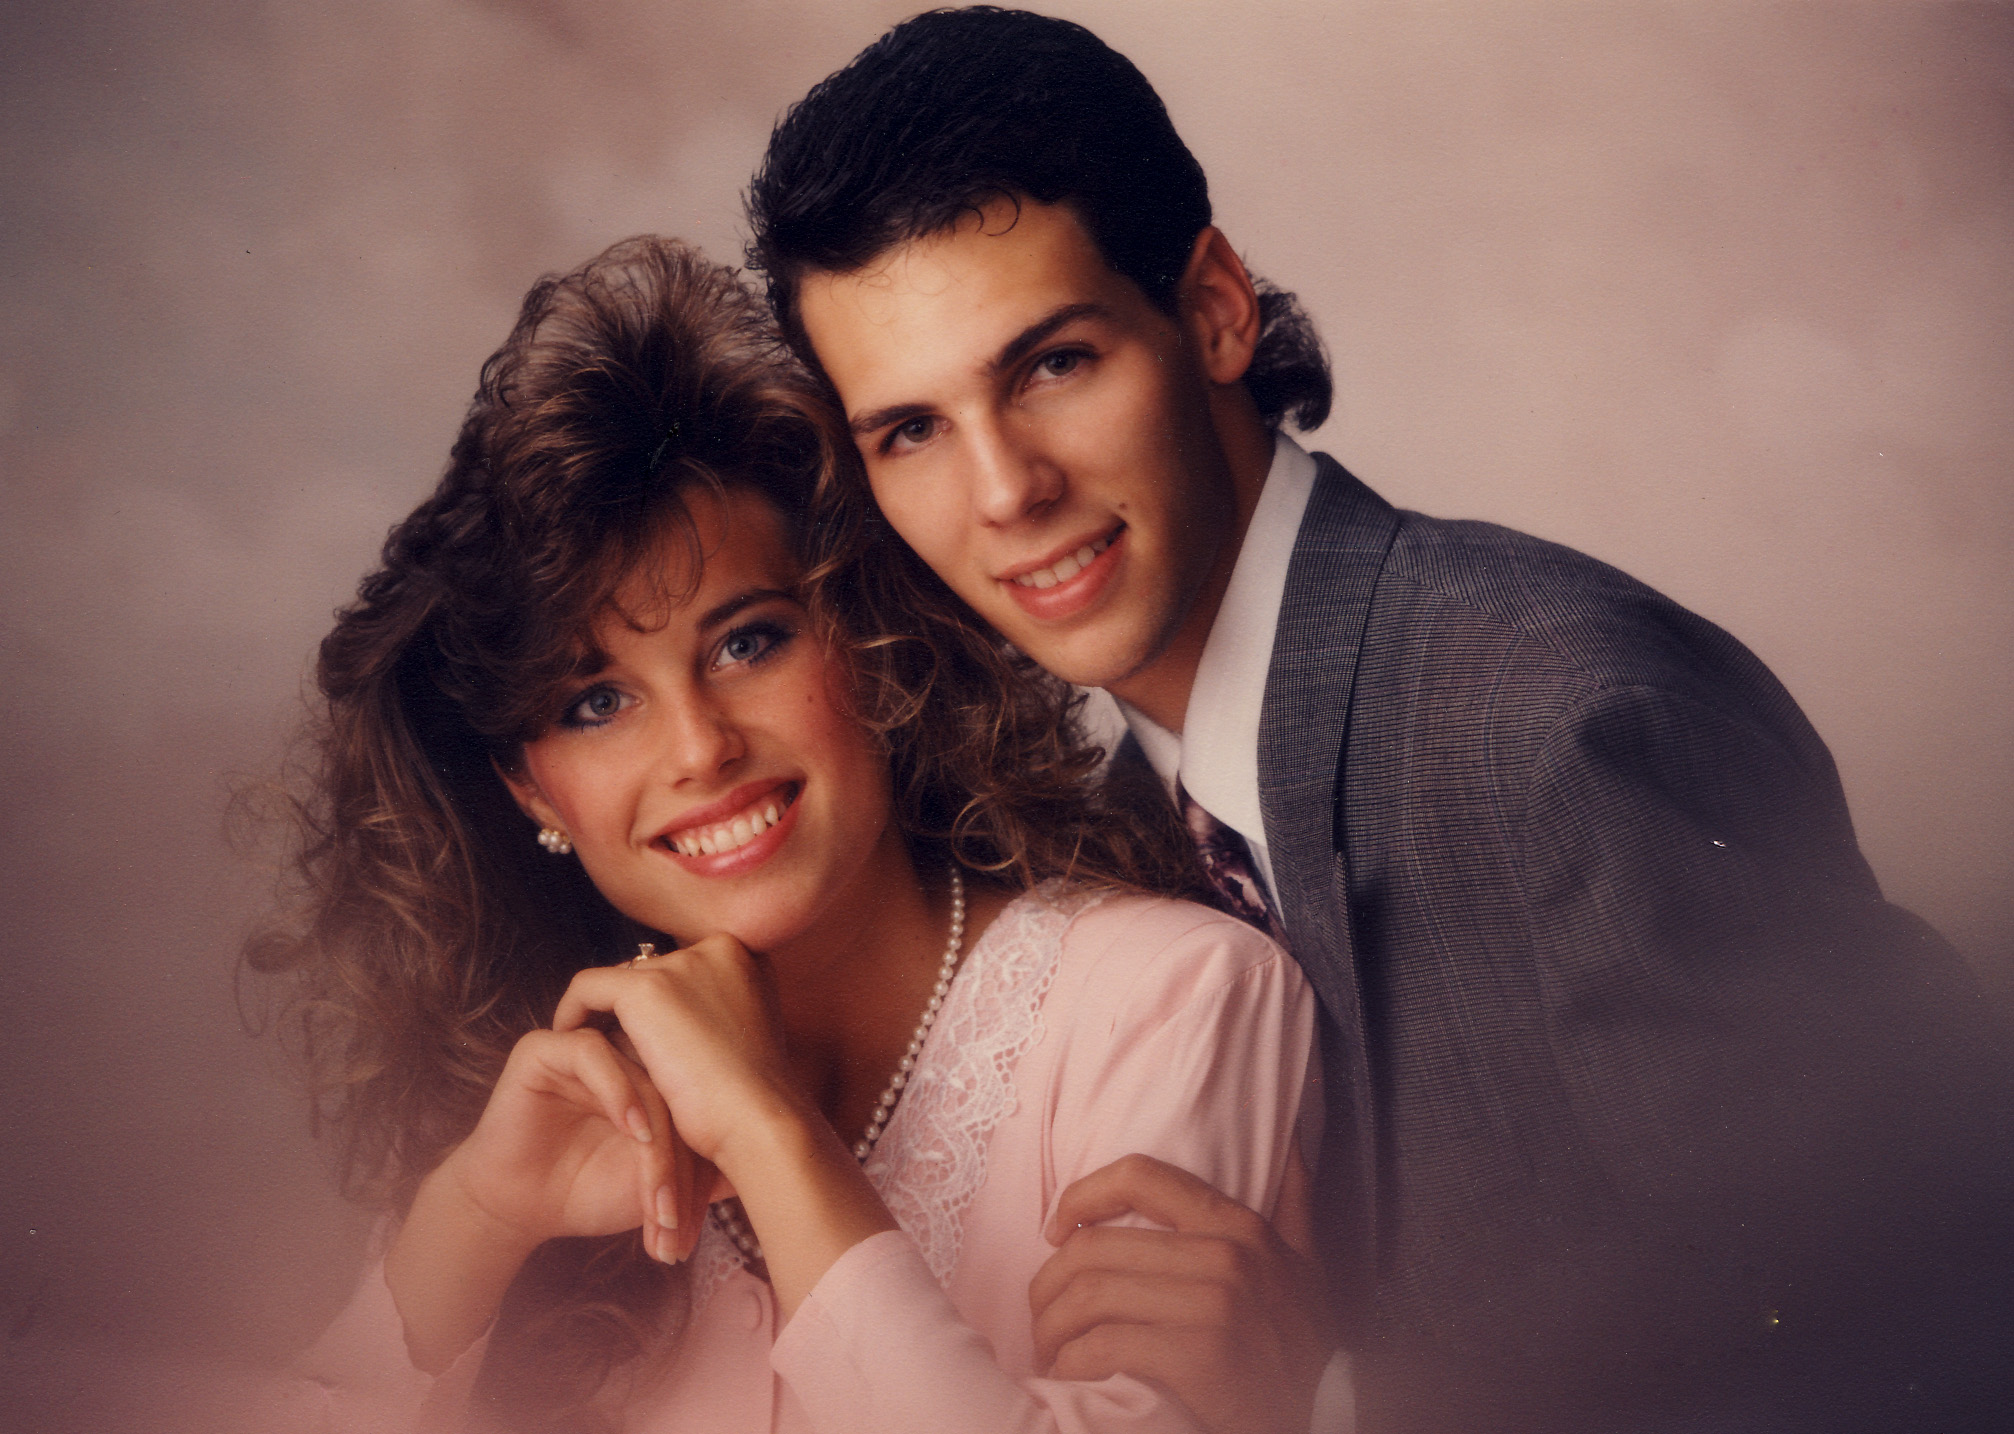 Jeff & Julia 1991